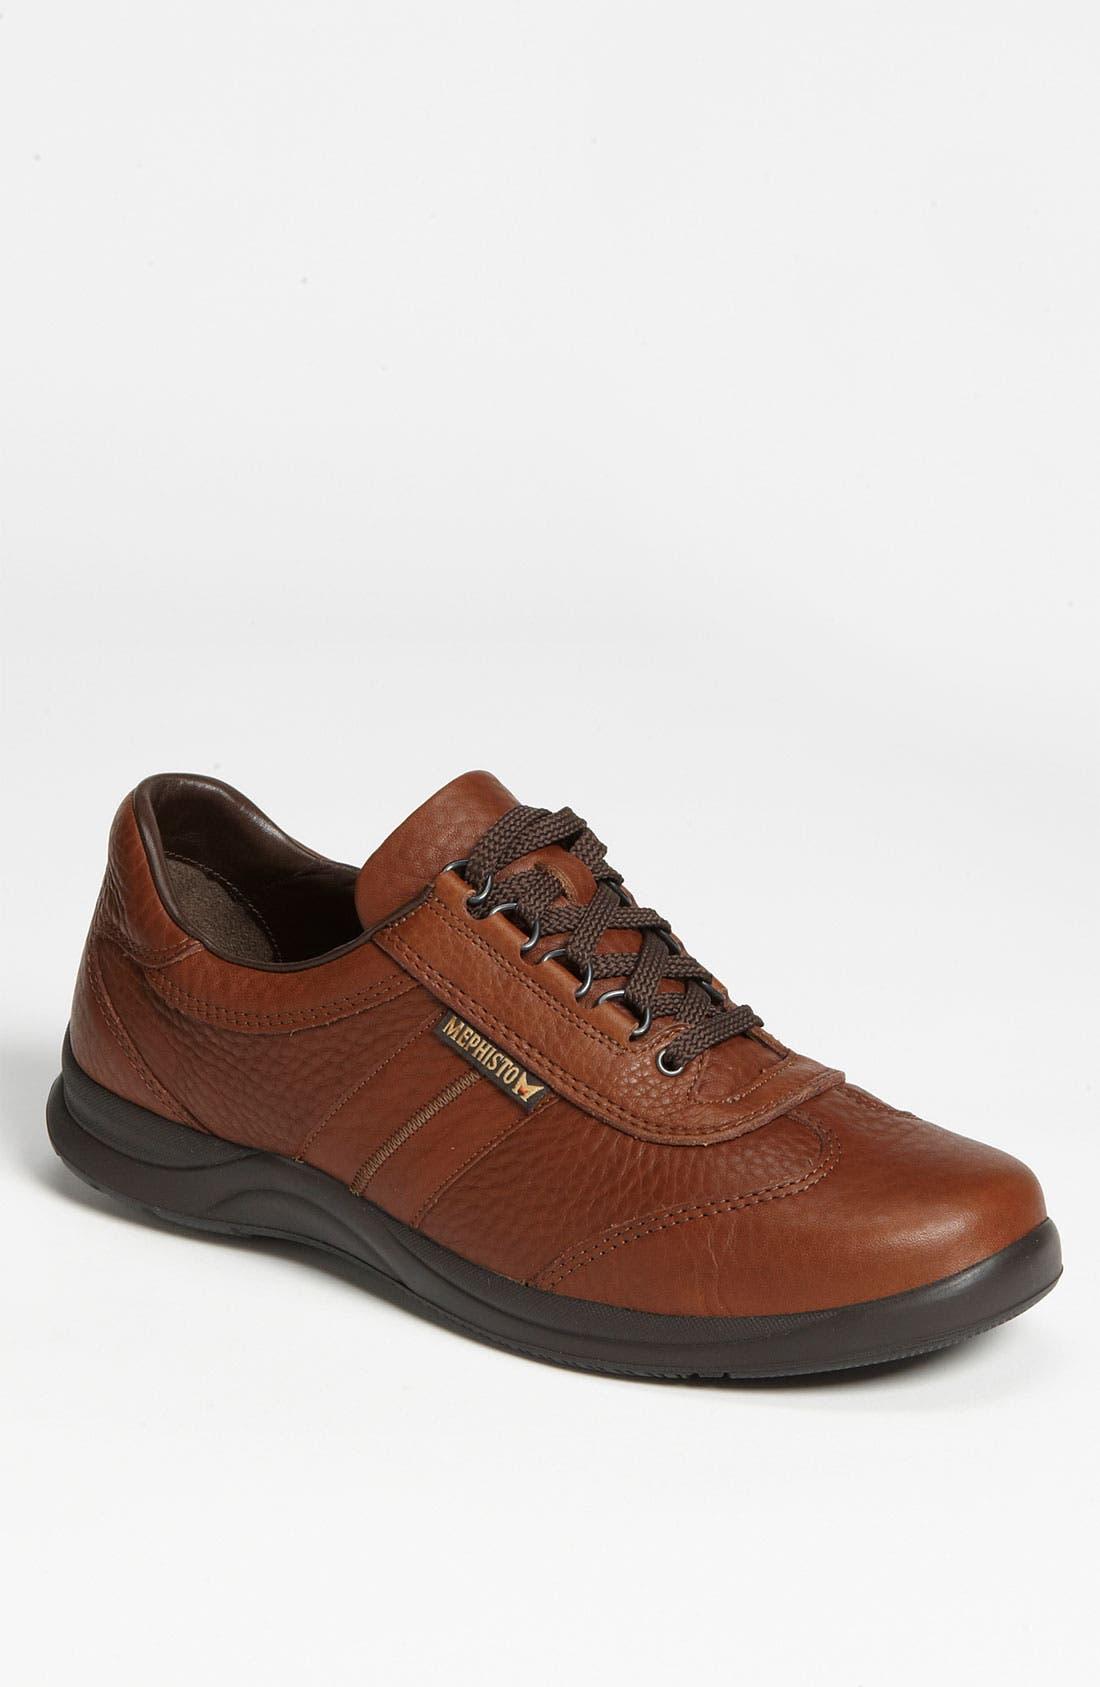 MEPHISTO 'Hike' Walking Shoe